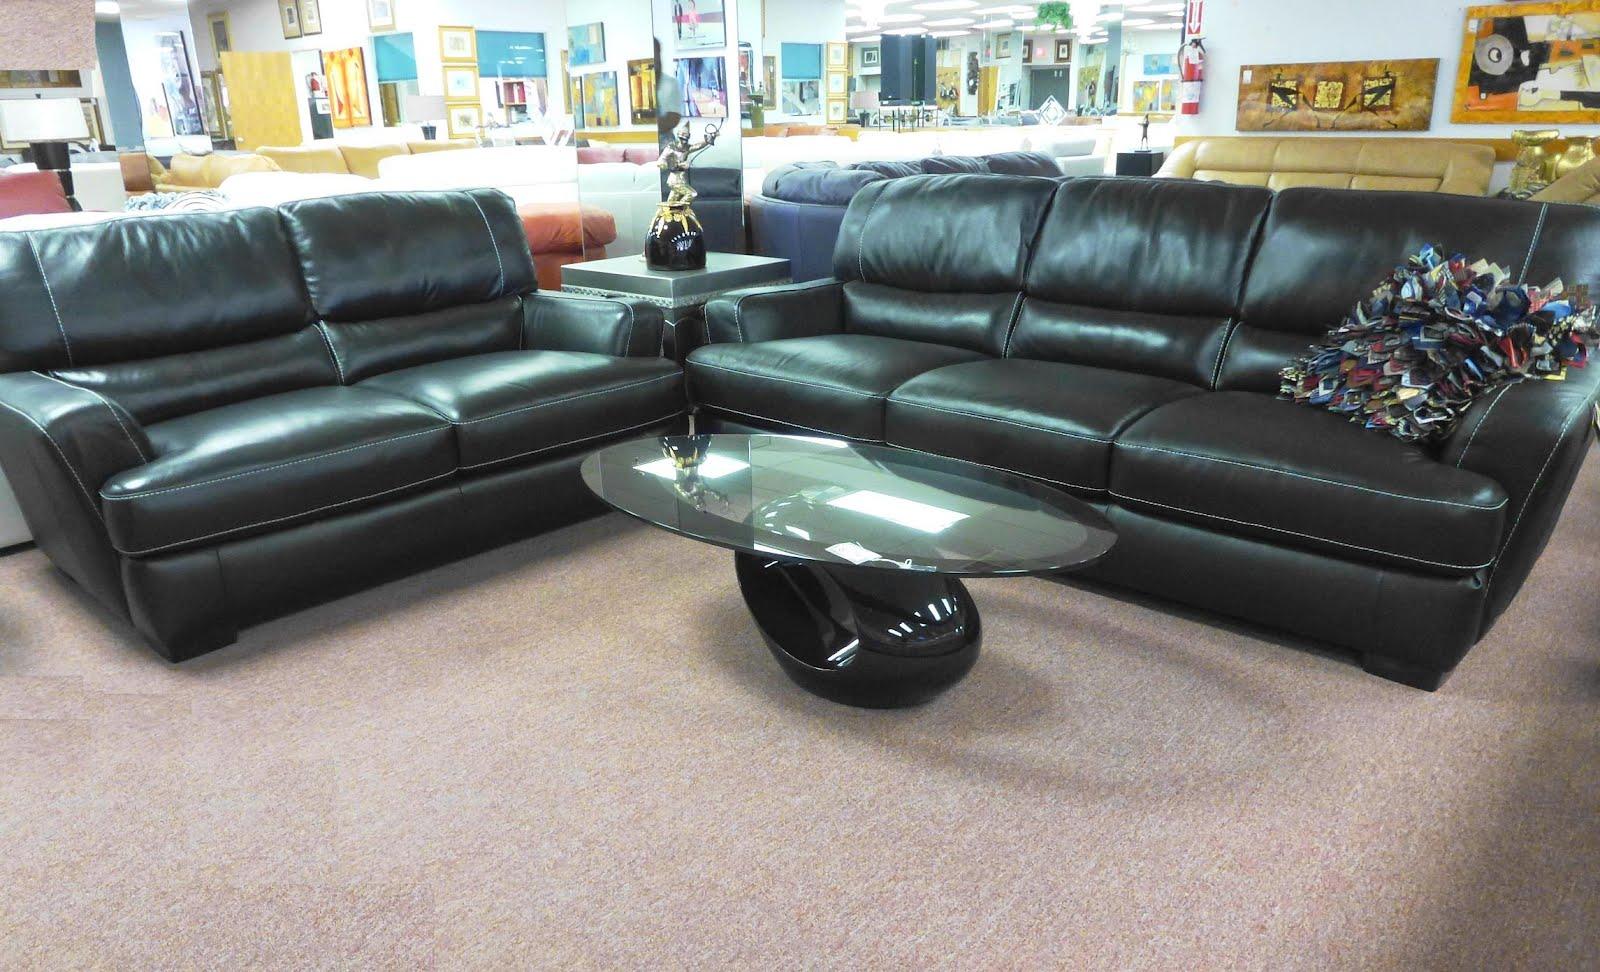 Natuzzi by interior concepts furniture italsofa for Labor day couch sale